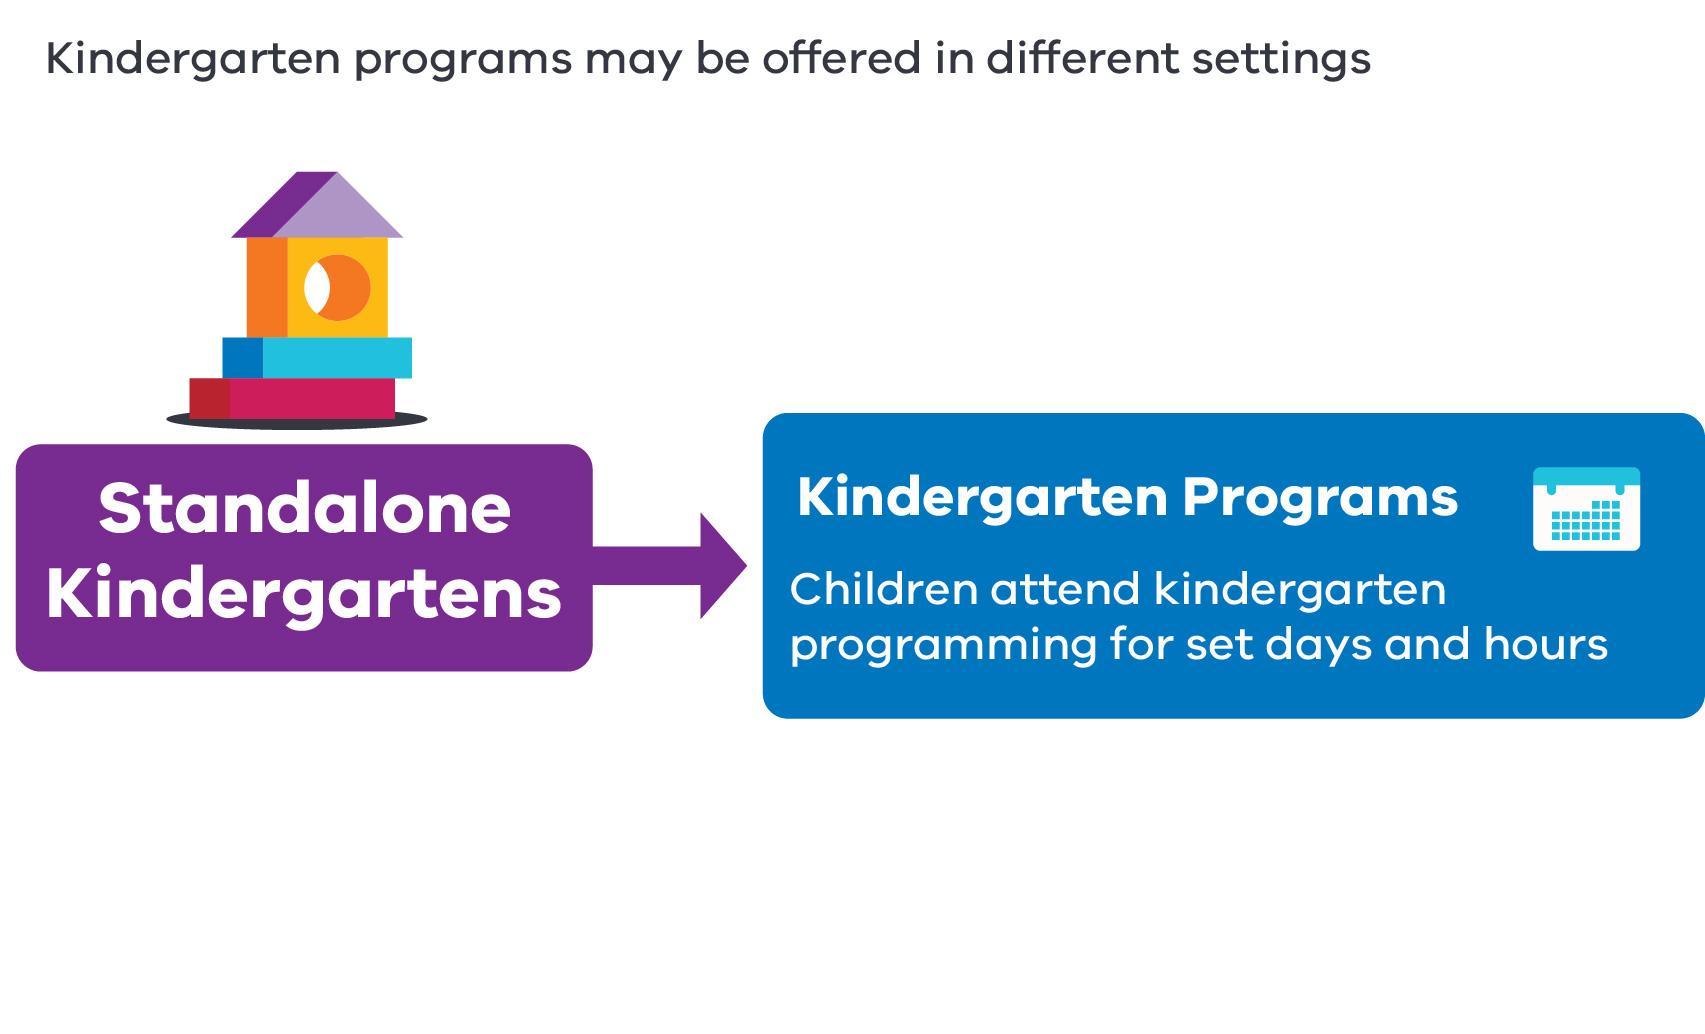 Standalone kindergarten. Long Day Care Services. Integrated Kindergarten Programs.